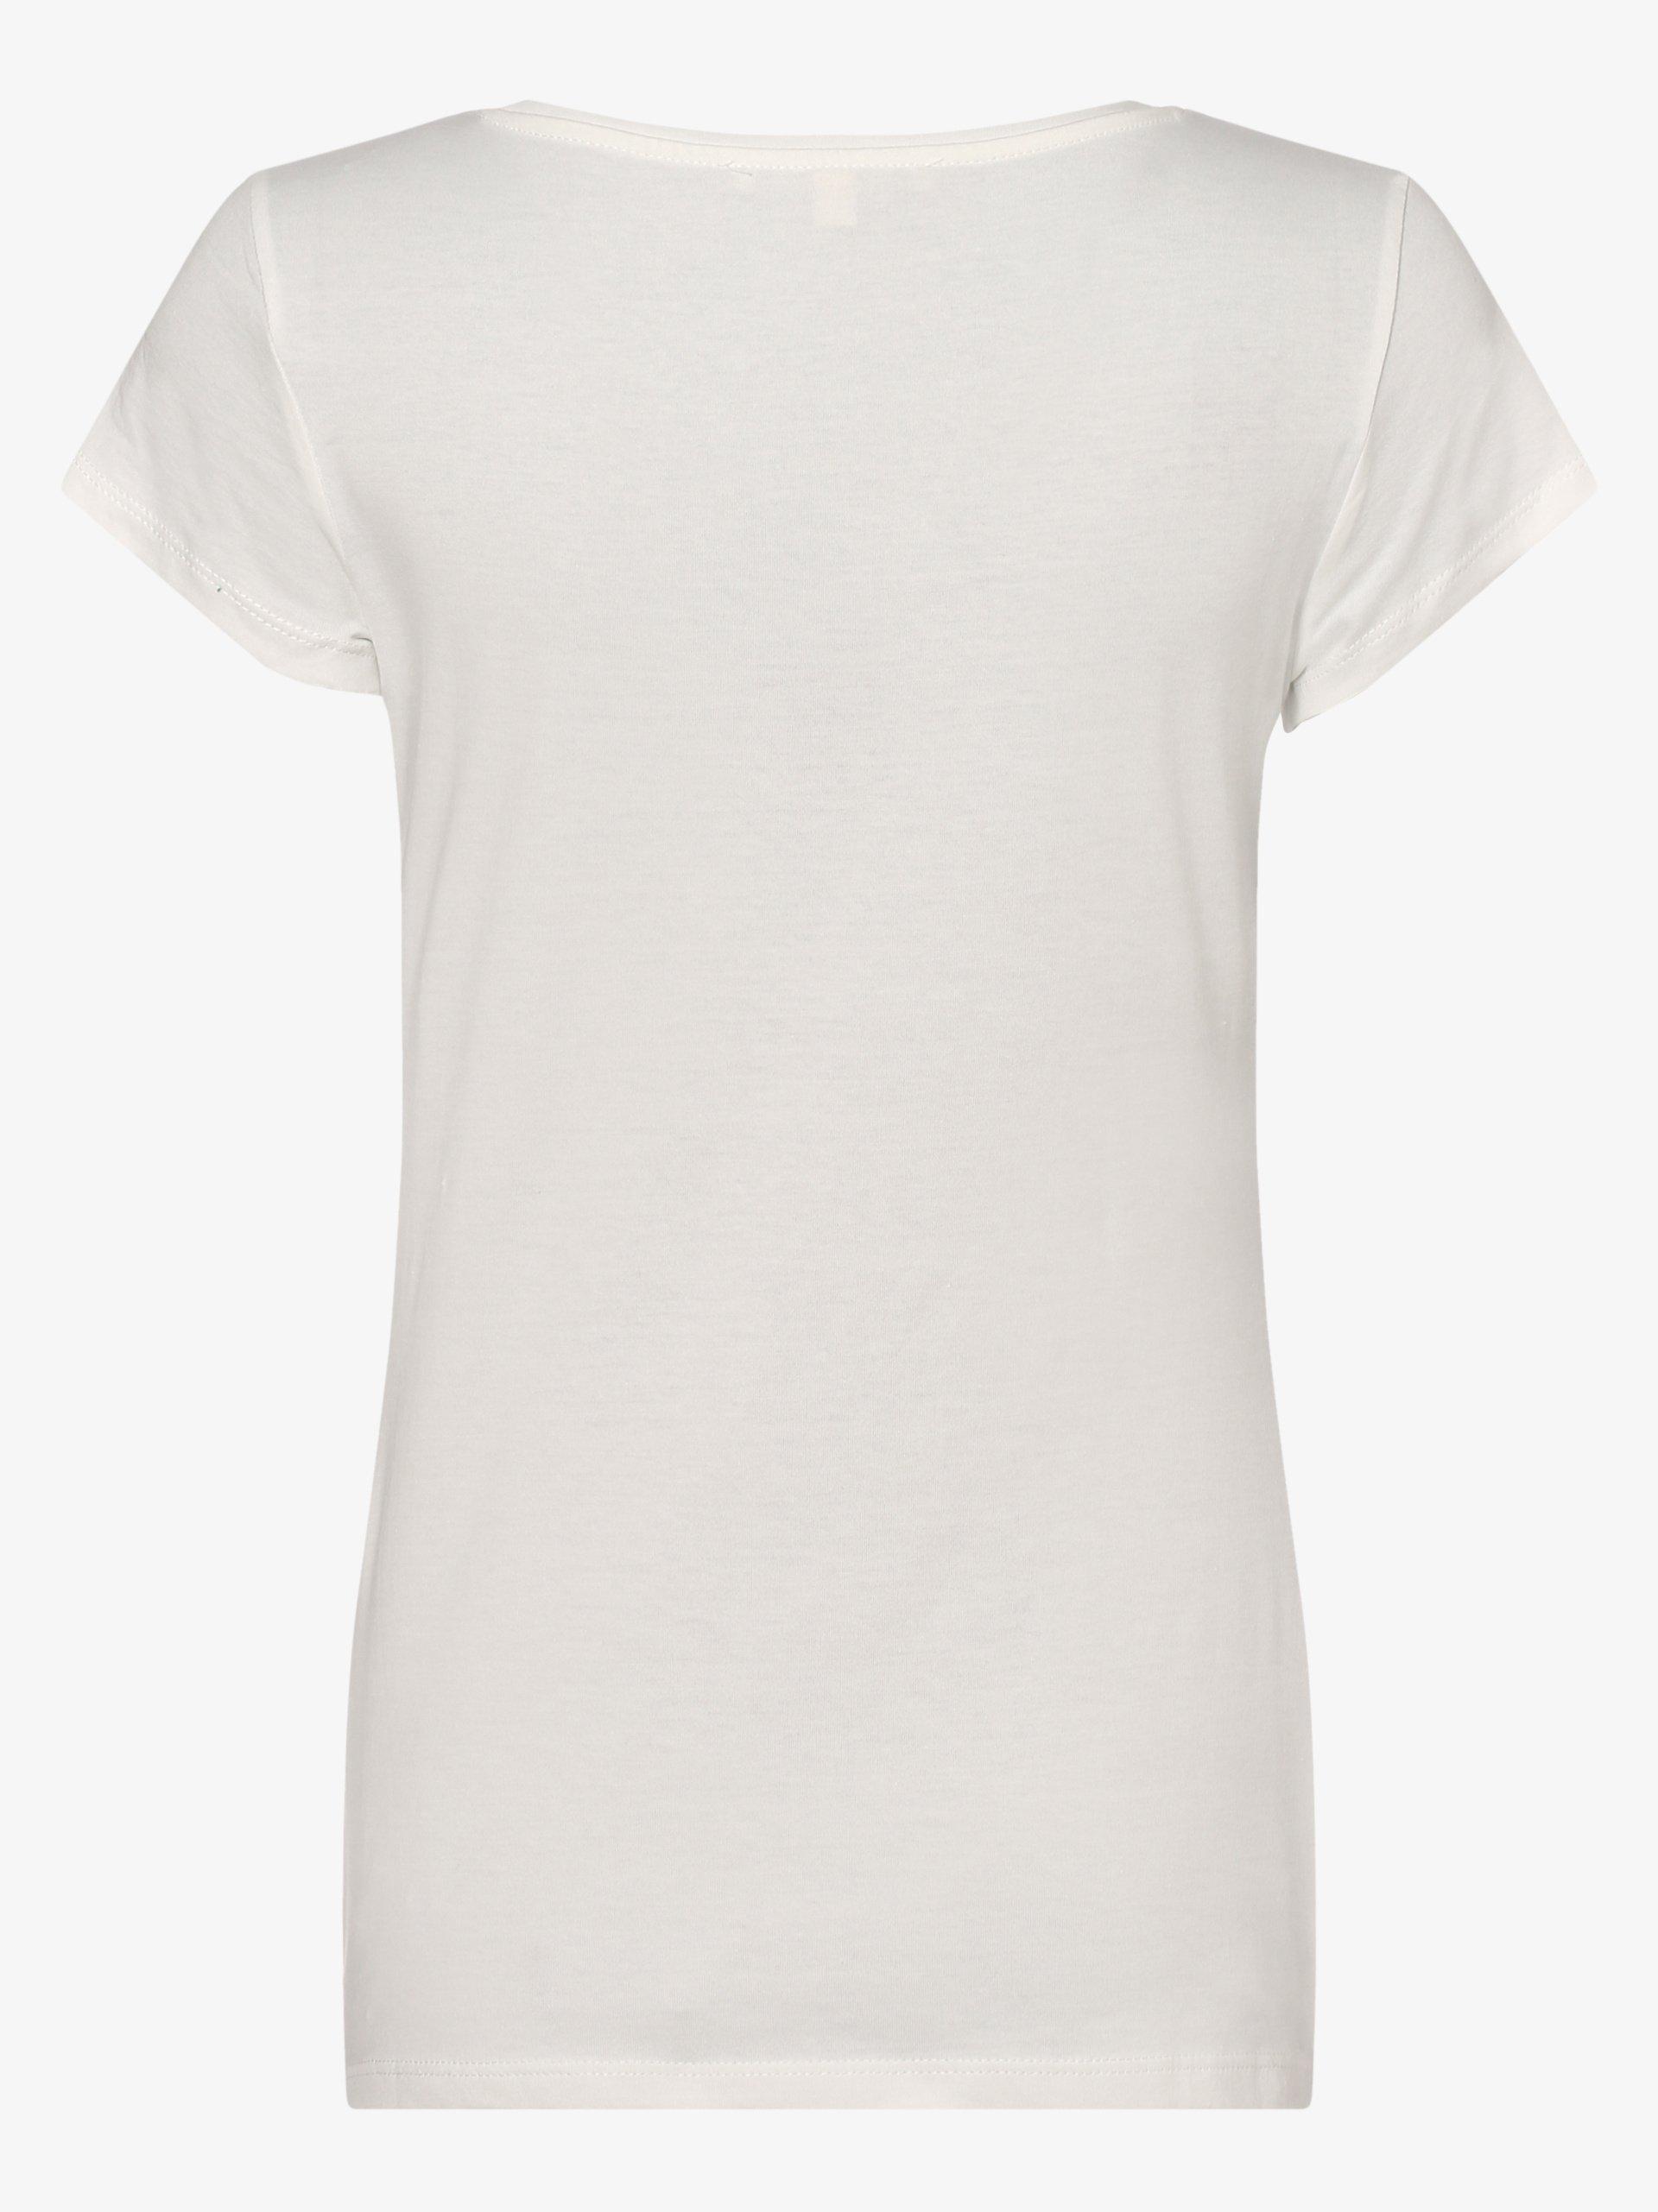 Tom Tailor Denim Damen T-Shirt